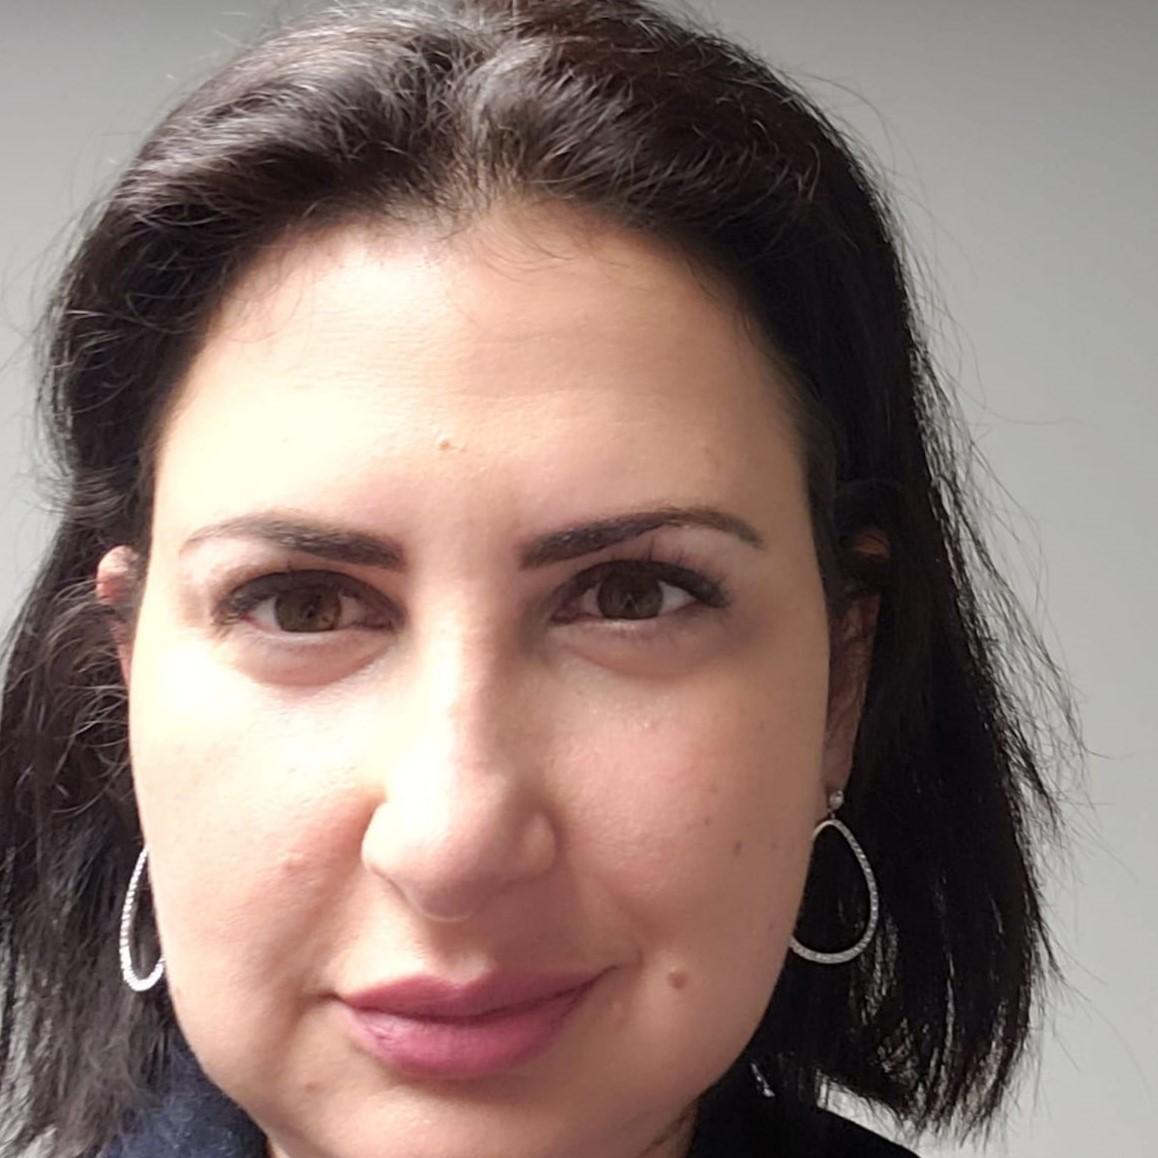 Mrs. Alina Vosk